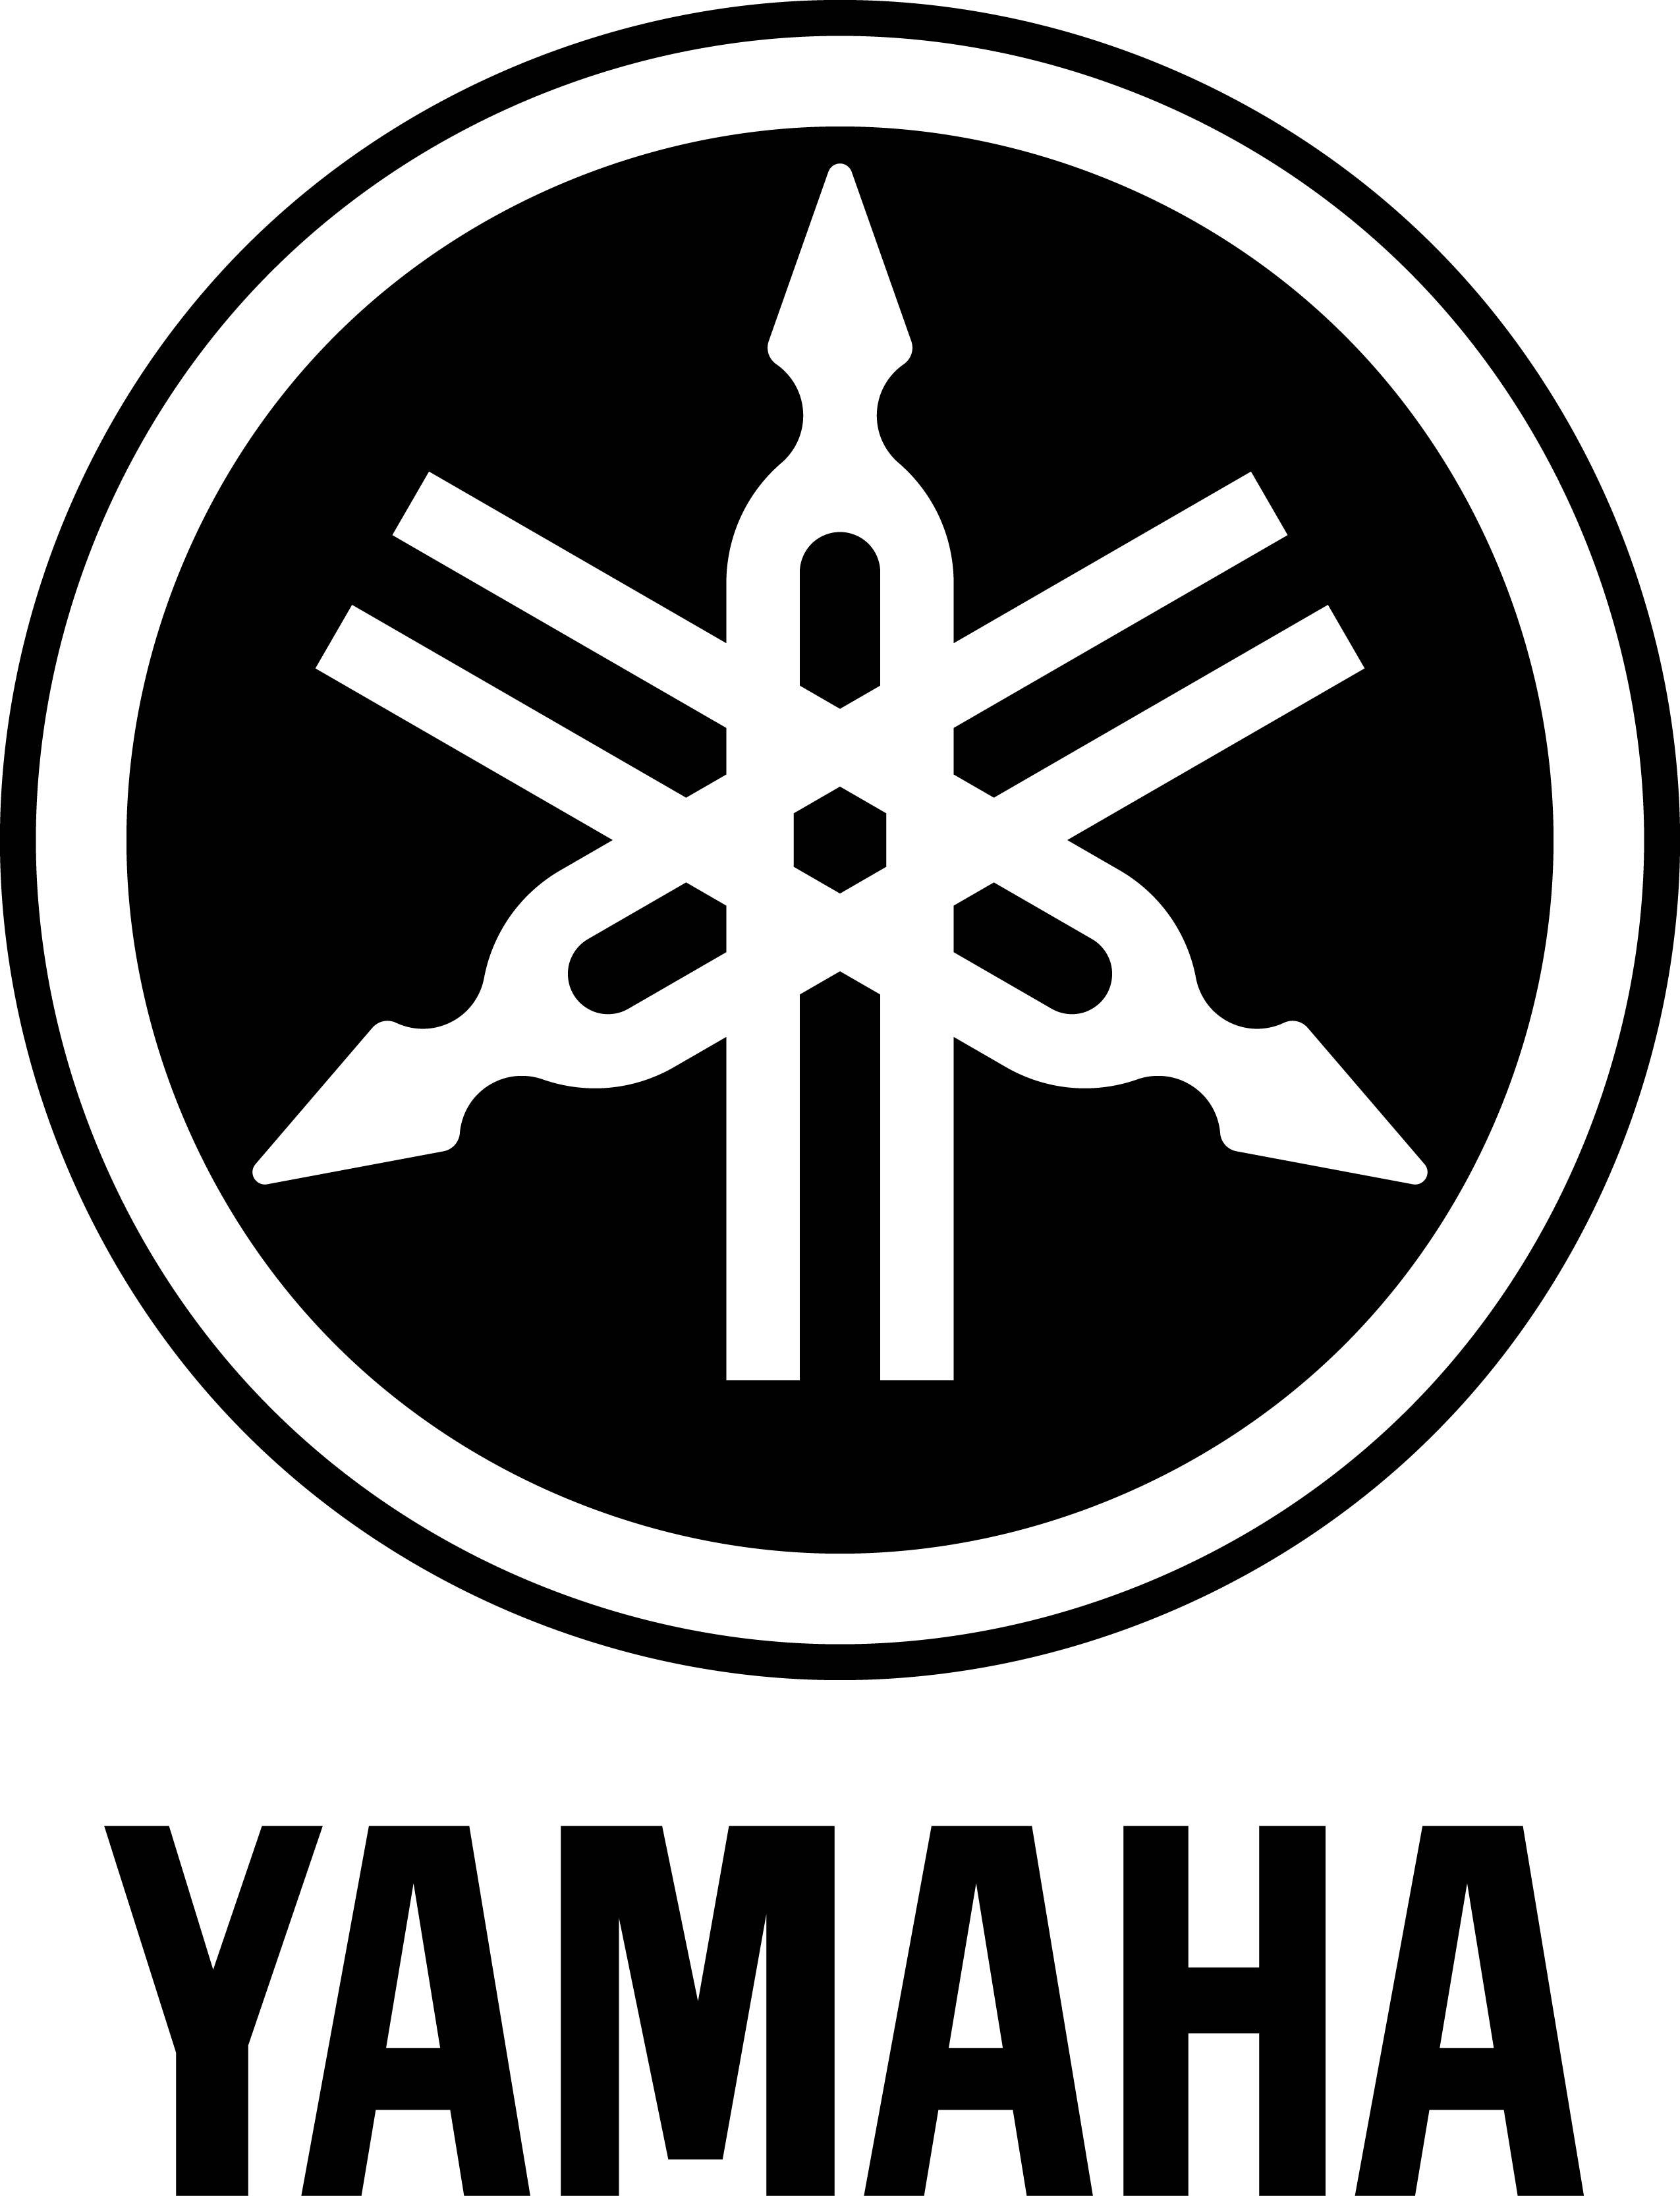 71655d1138890920-yamaha-logo-fz6-logo-2yamaha-converted- jpgYamaha Musical Instruments Logo